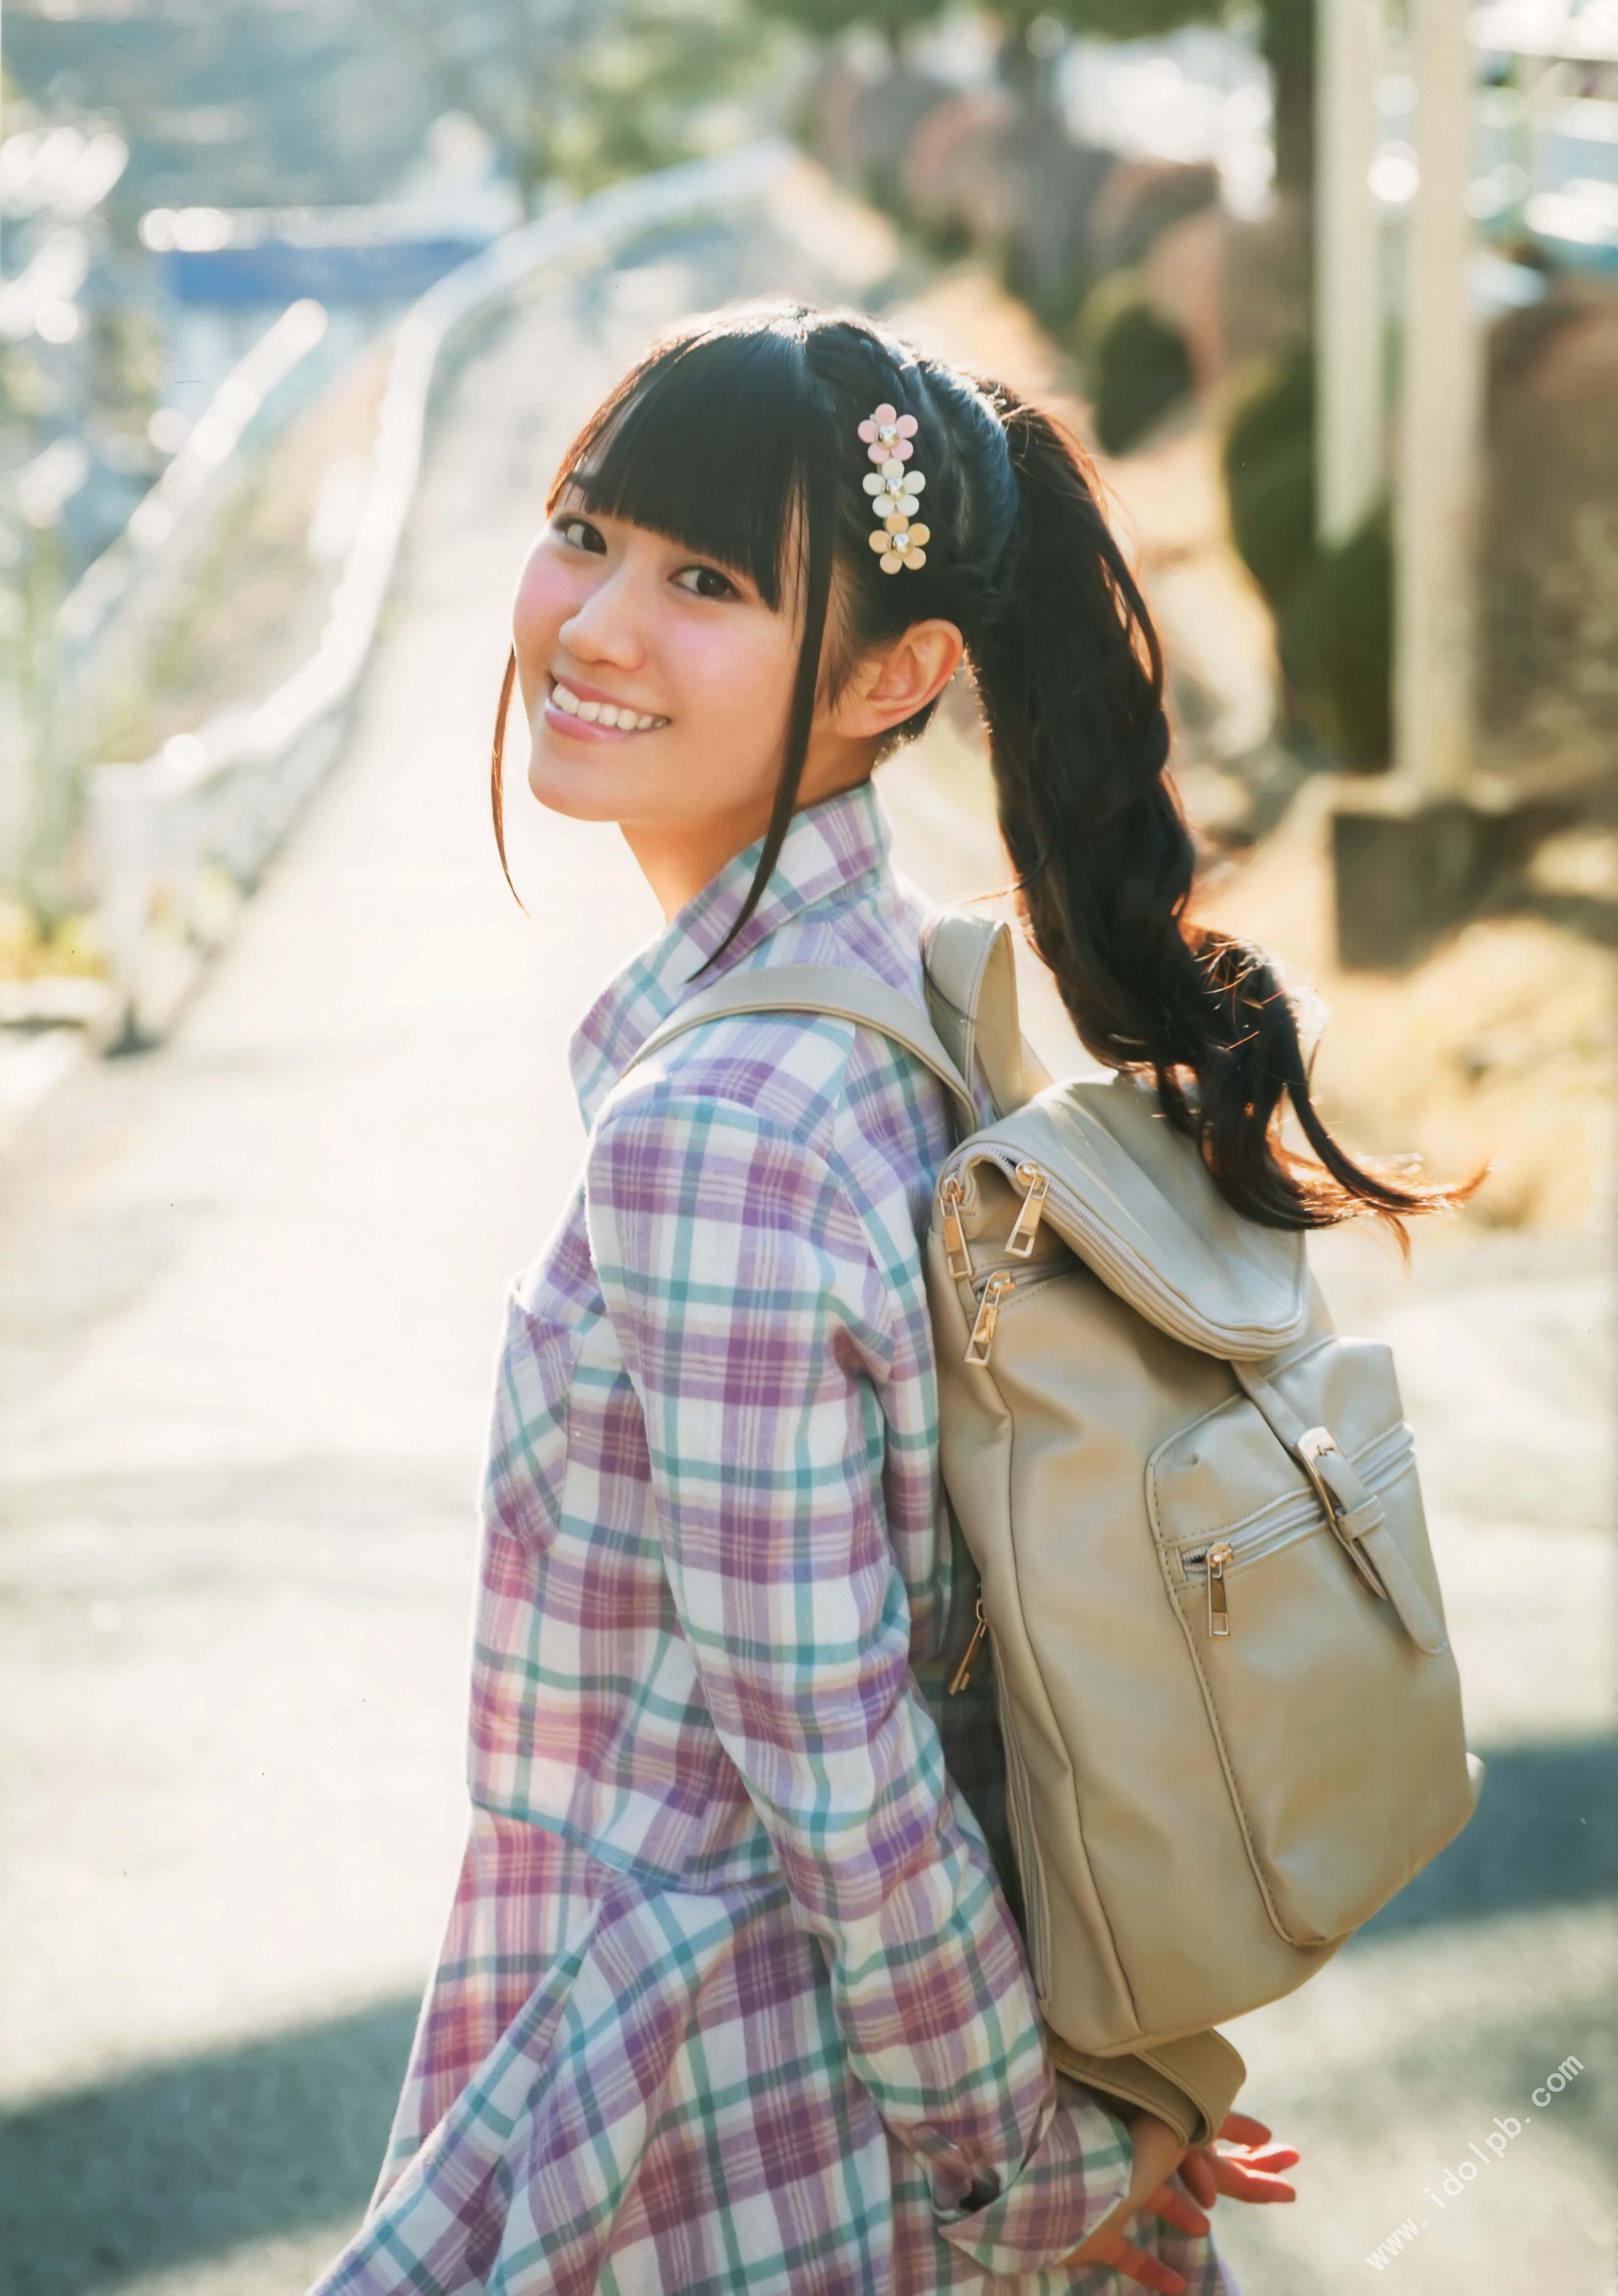 ogura_yui105.jpg